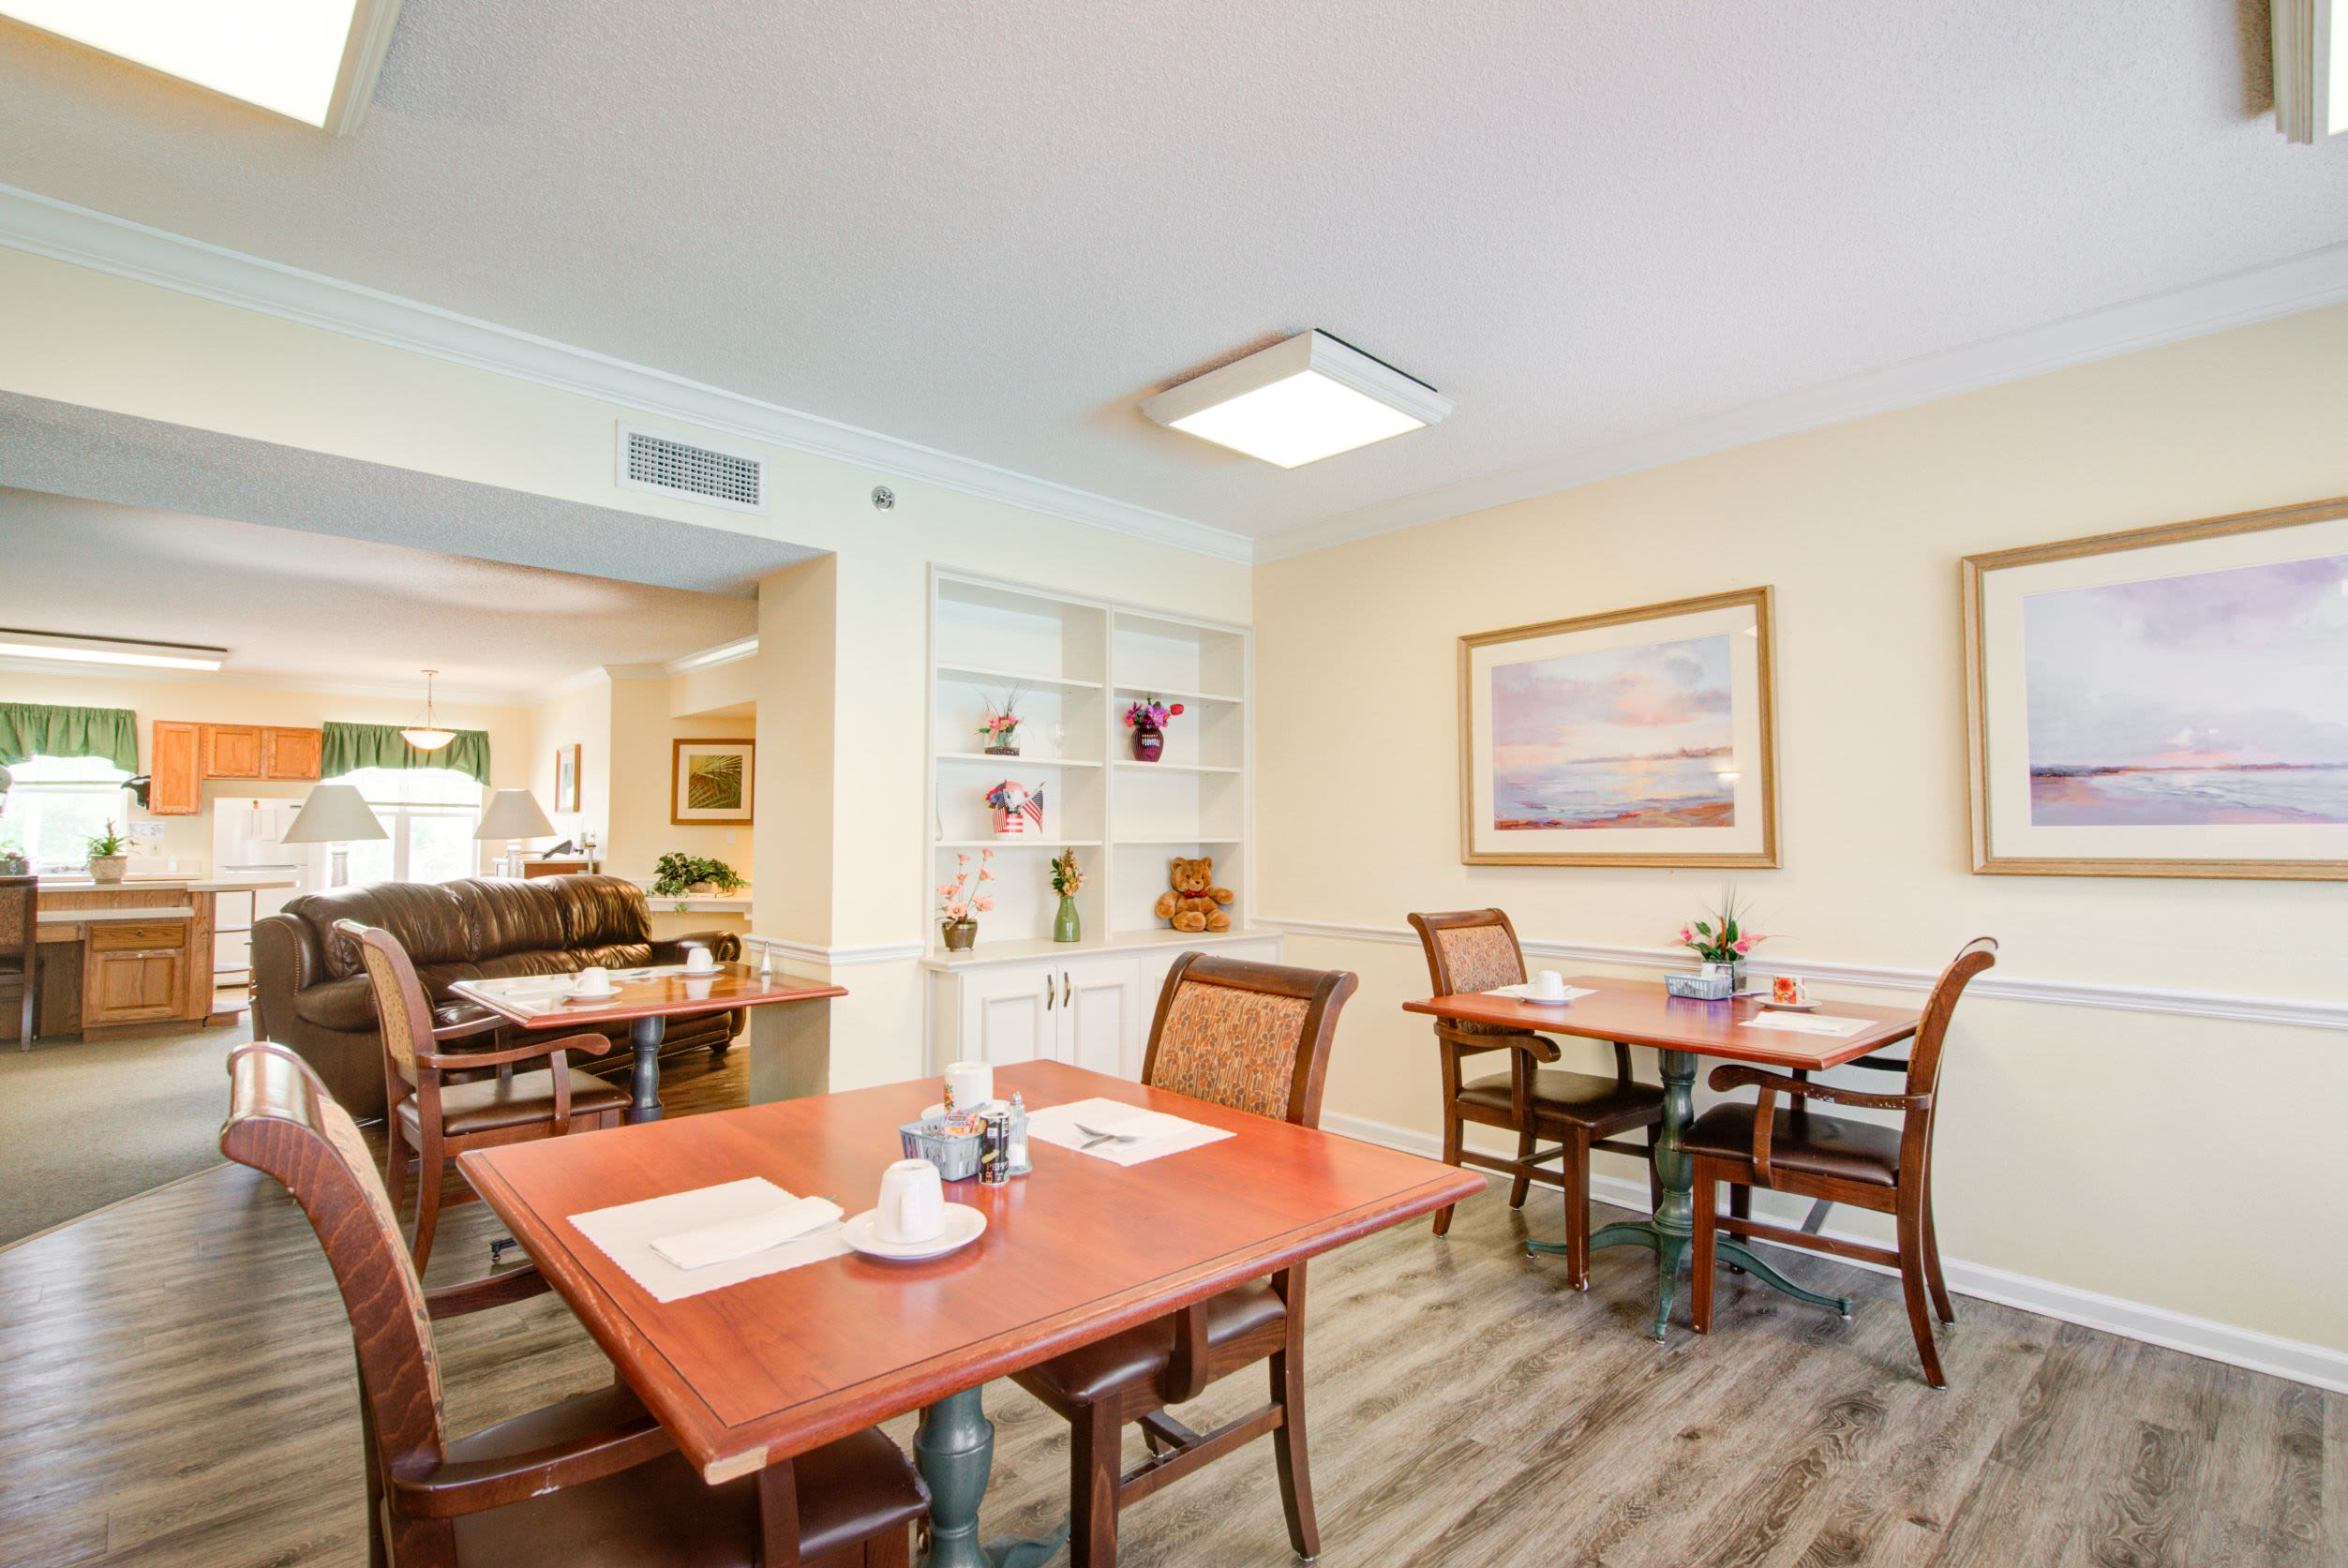 dining area at Truewood by Merrill, Venice in Venice, FL